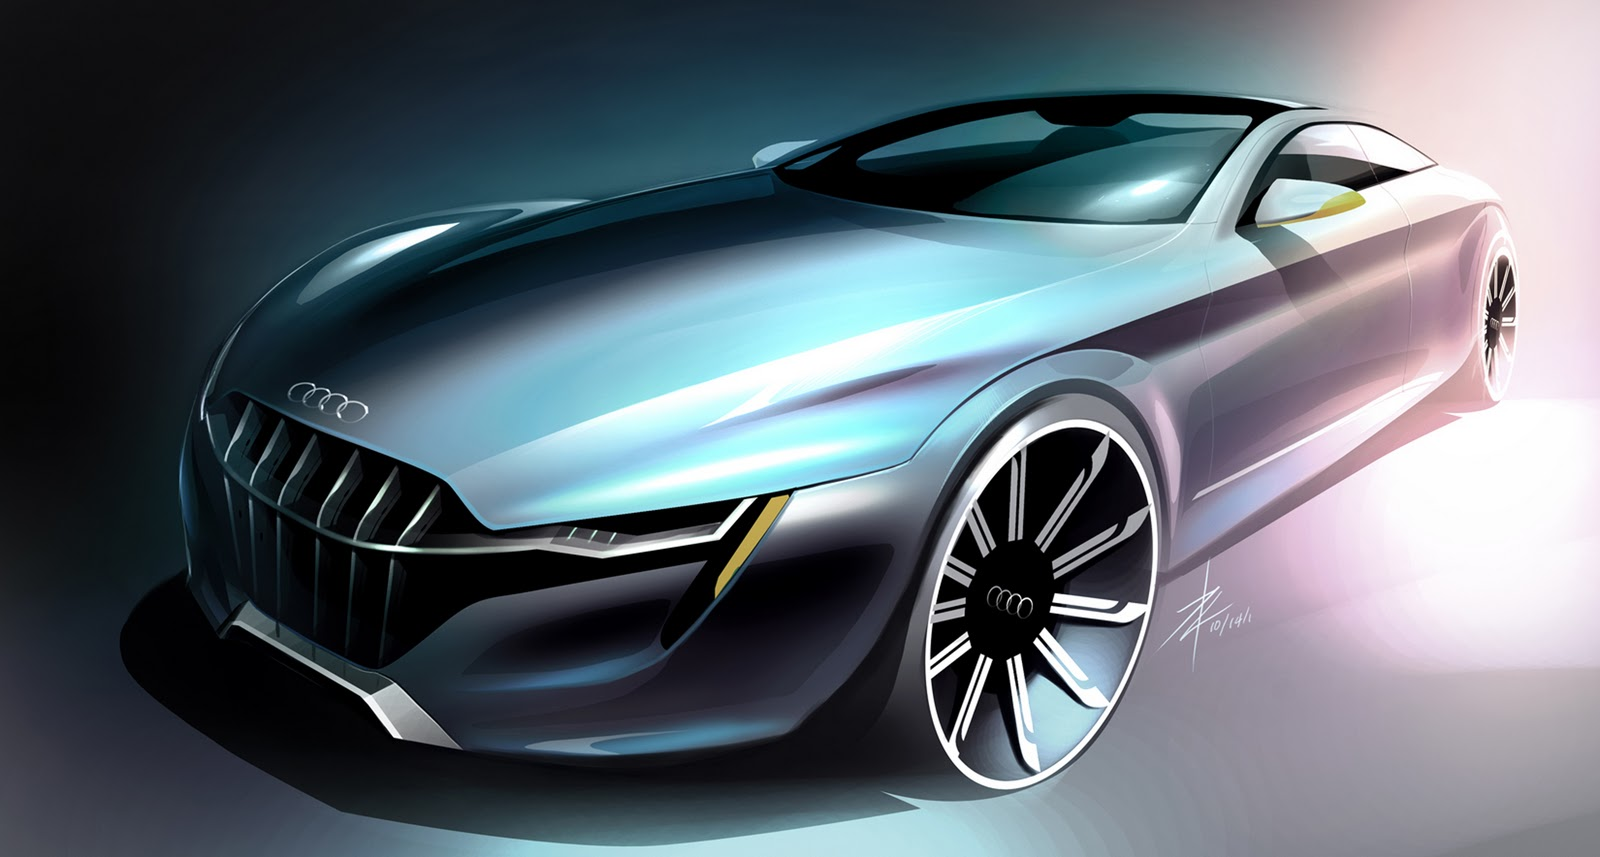 DSNG'S SCI FI MEGAVERSE: FUTURISTIC AUDI CONCEPT CAR DESIGNS